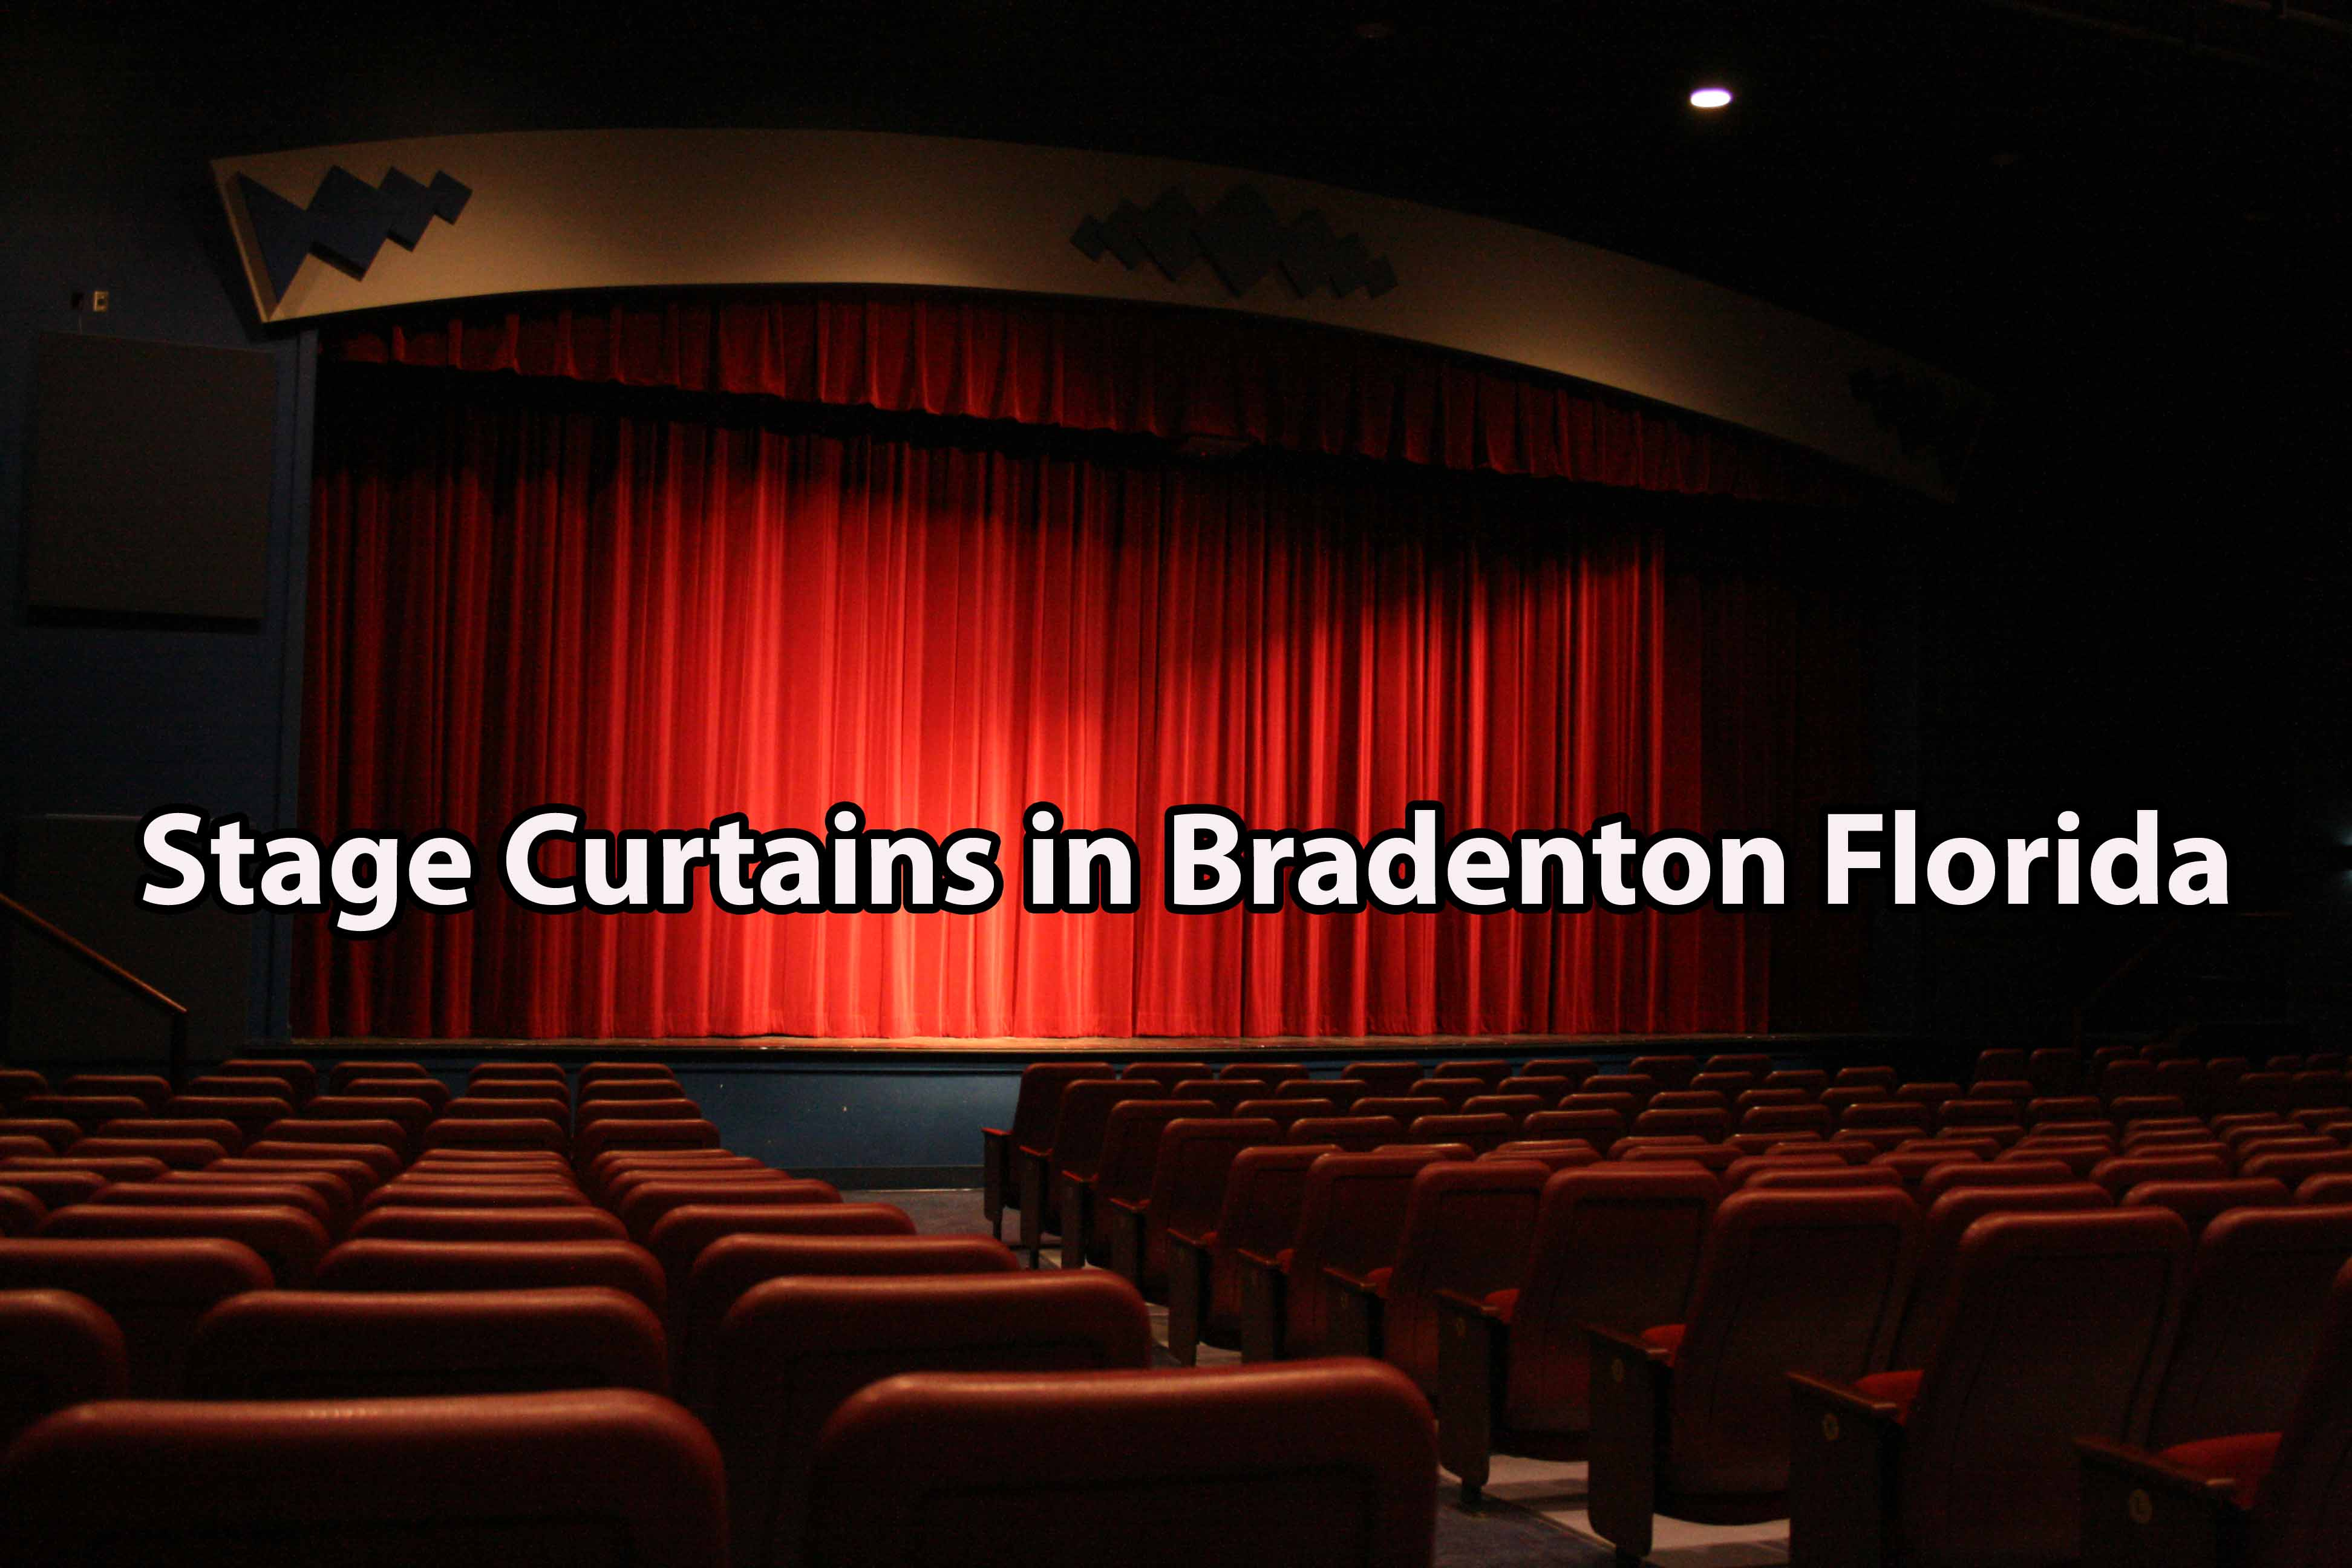 Stage Curtains in Bradenton Florida